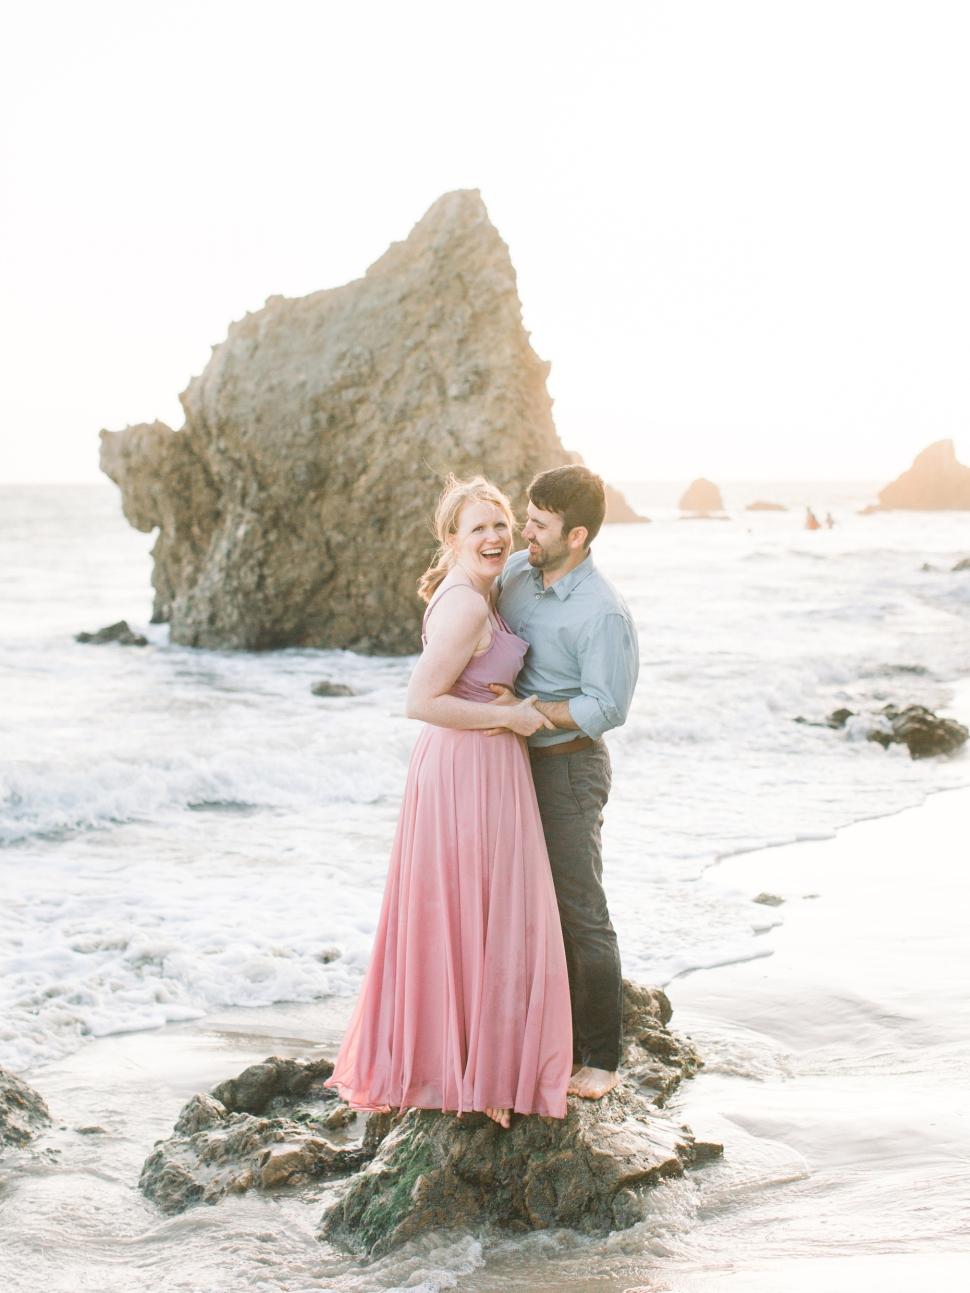 Malibu-Wedding-Photographer-Cassi-Claire-El-Matador-State-Beach-Engagement-Session_05.jpg